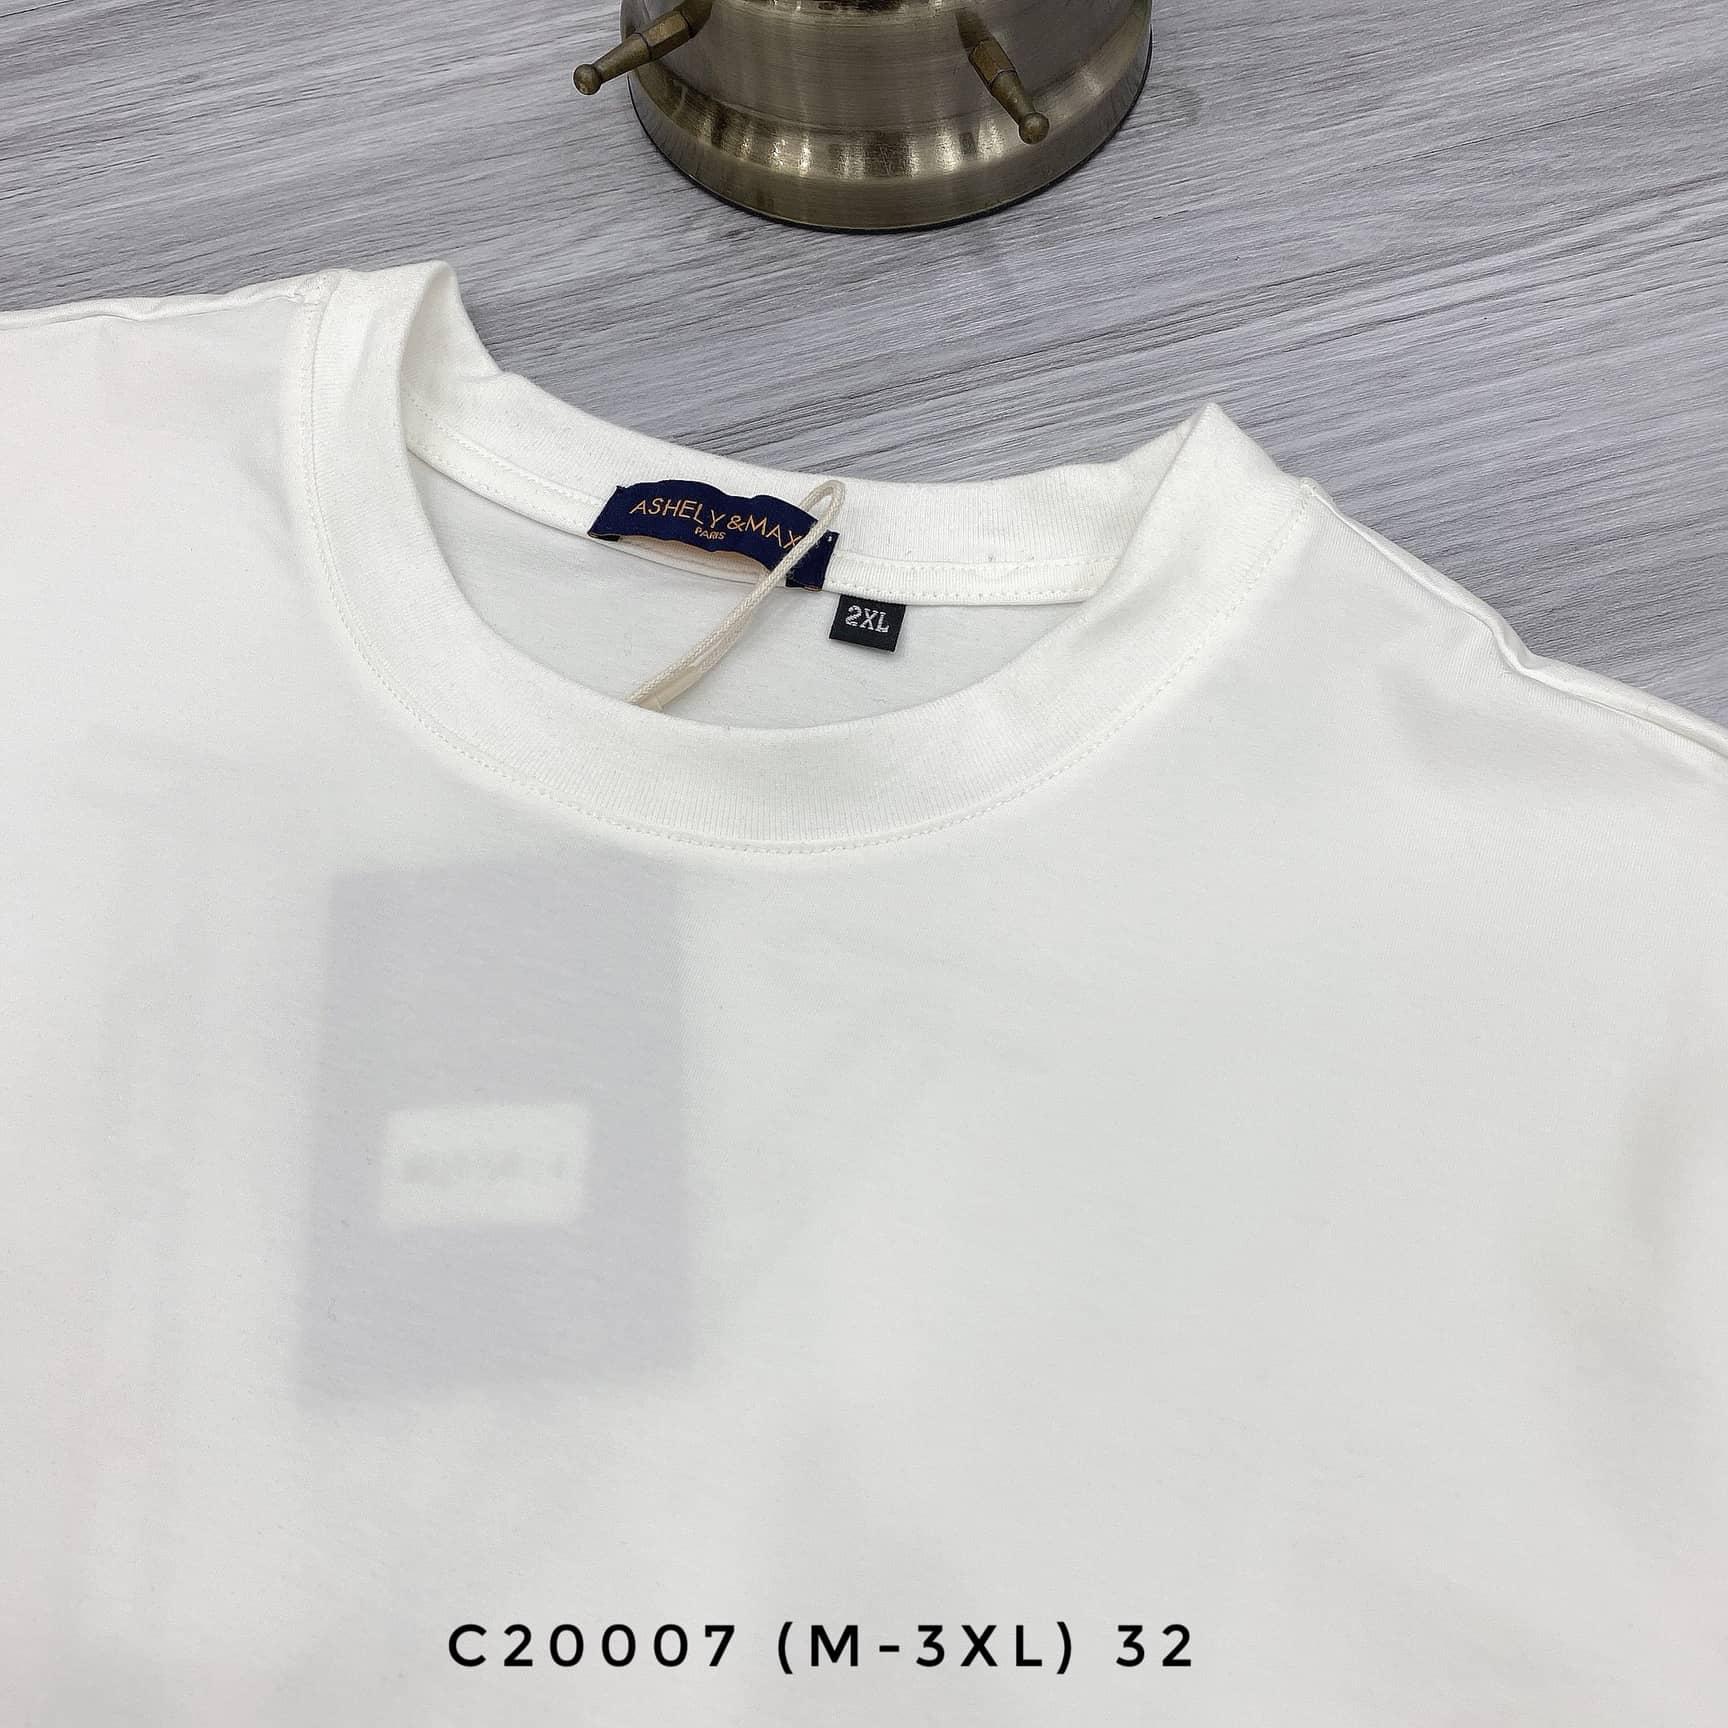 AT CỔ TRÒN C20007 (M-3XL)